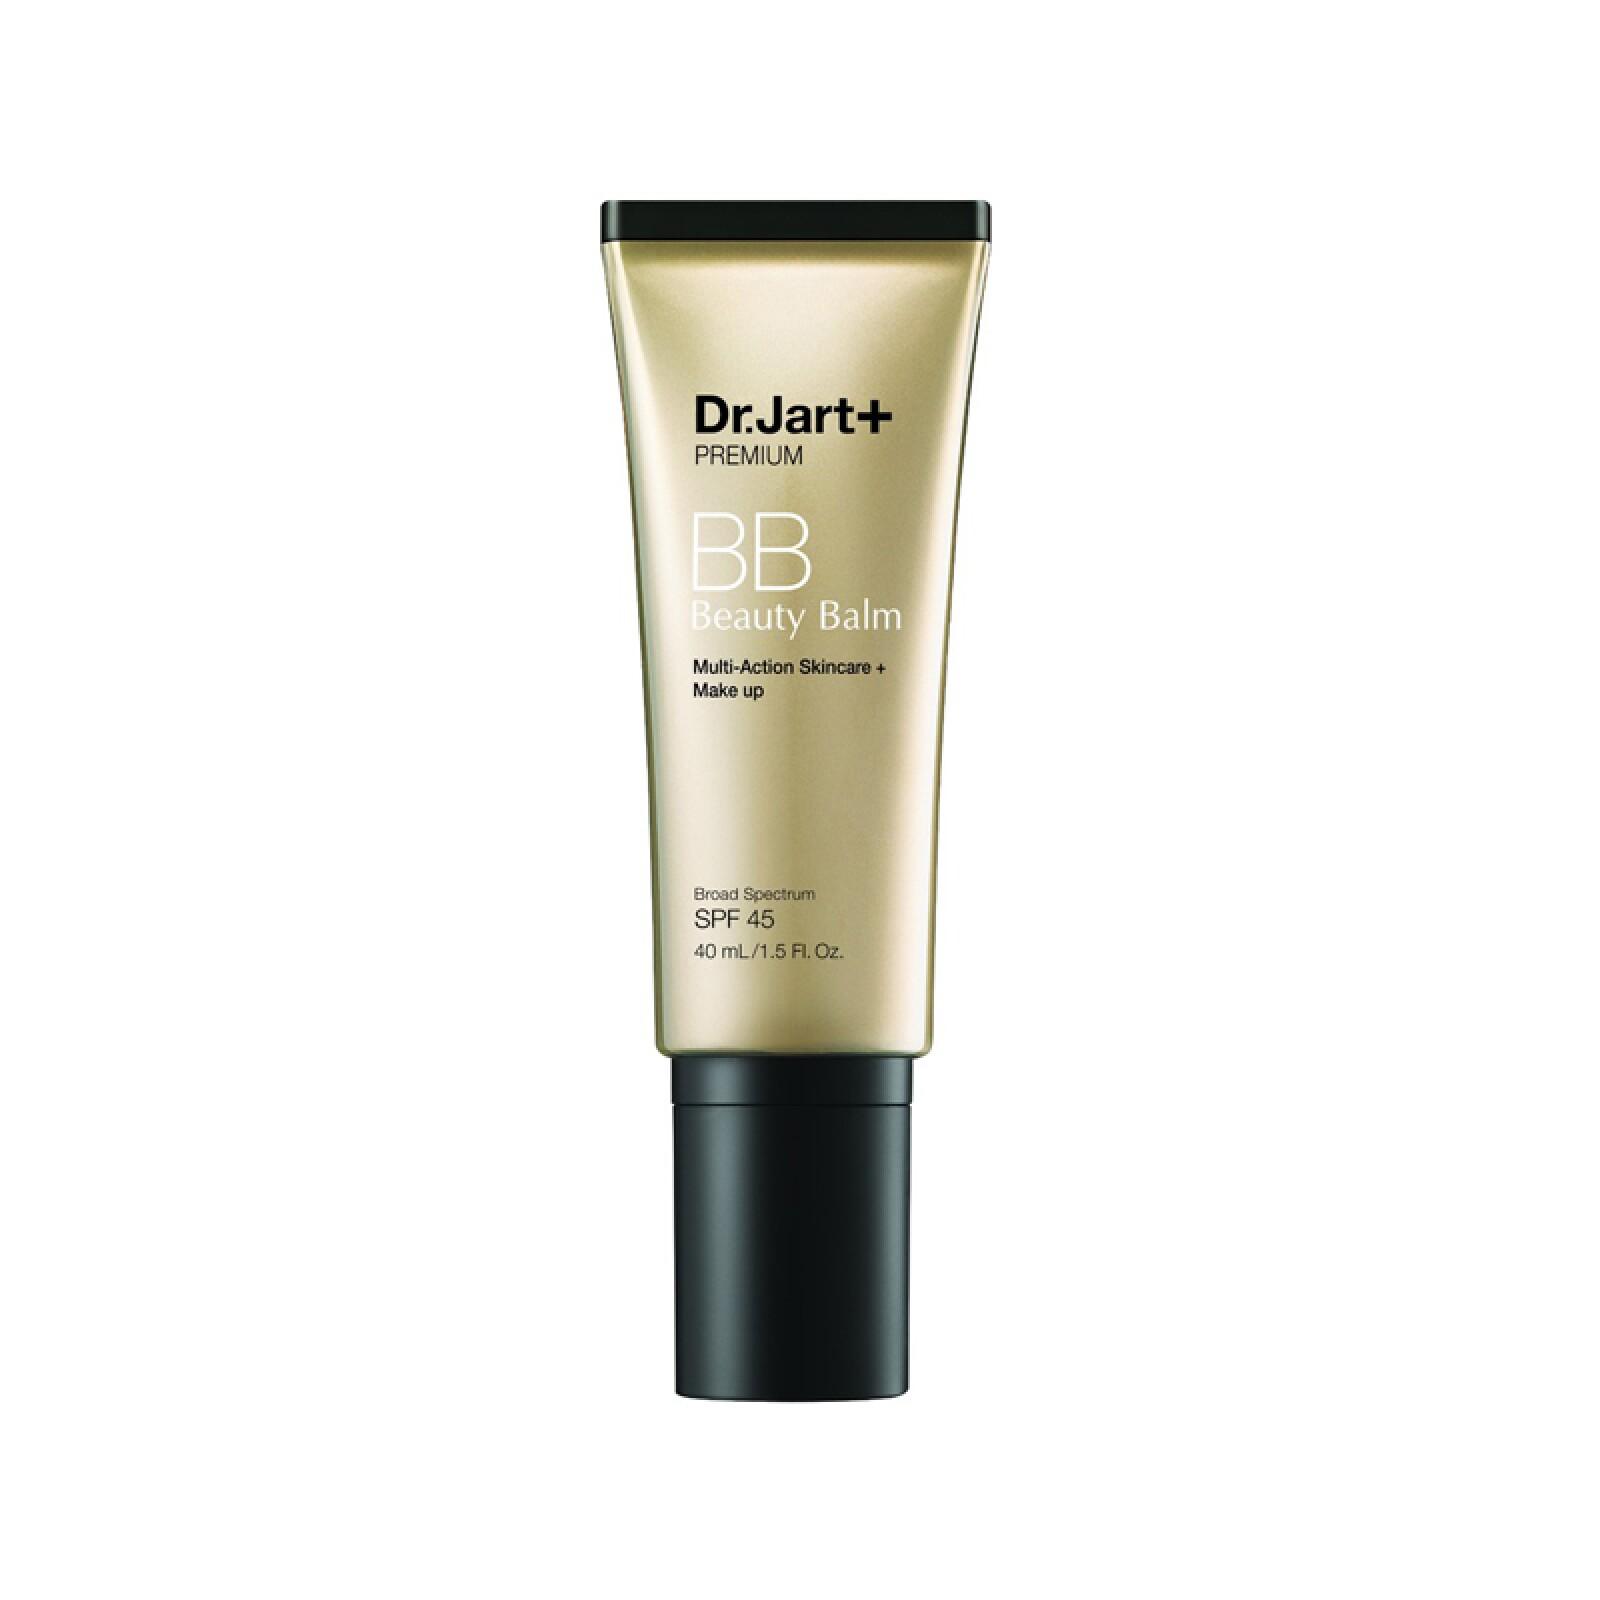 bb cream-bb creams-maquillaje-makeup-tratamiento-hidratante-beauty balm-dr jart